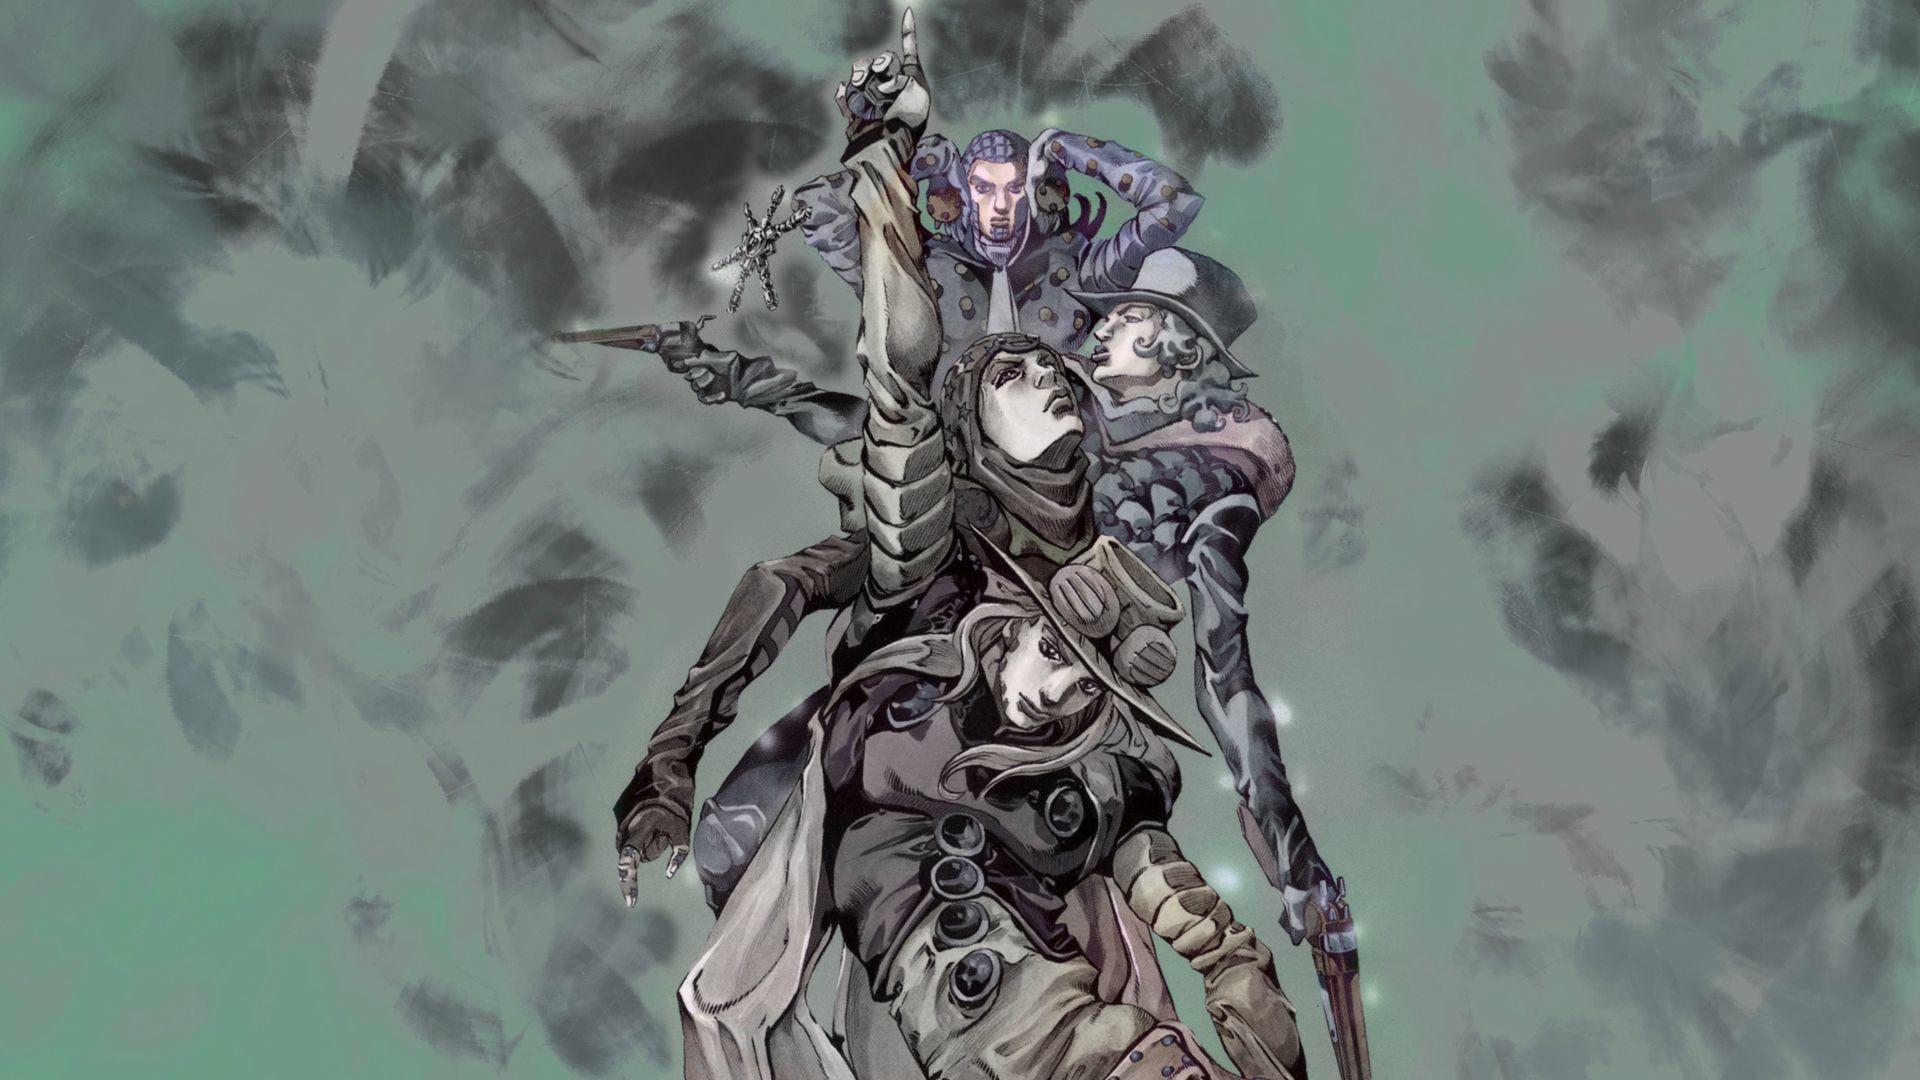 Wallpaper : illustration, anime, JoJo's Bizarre Adventure